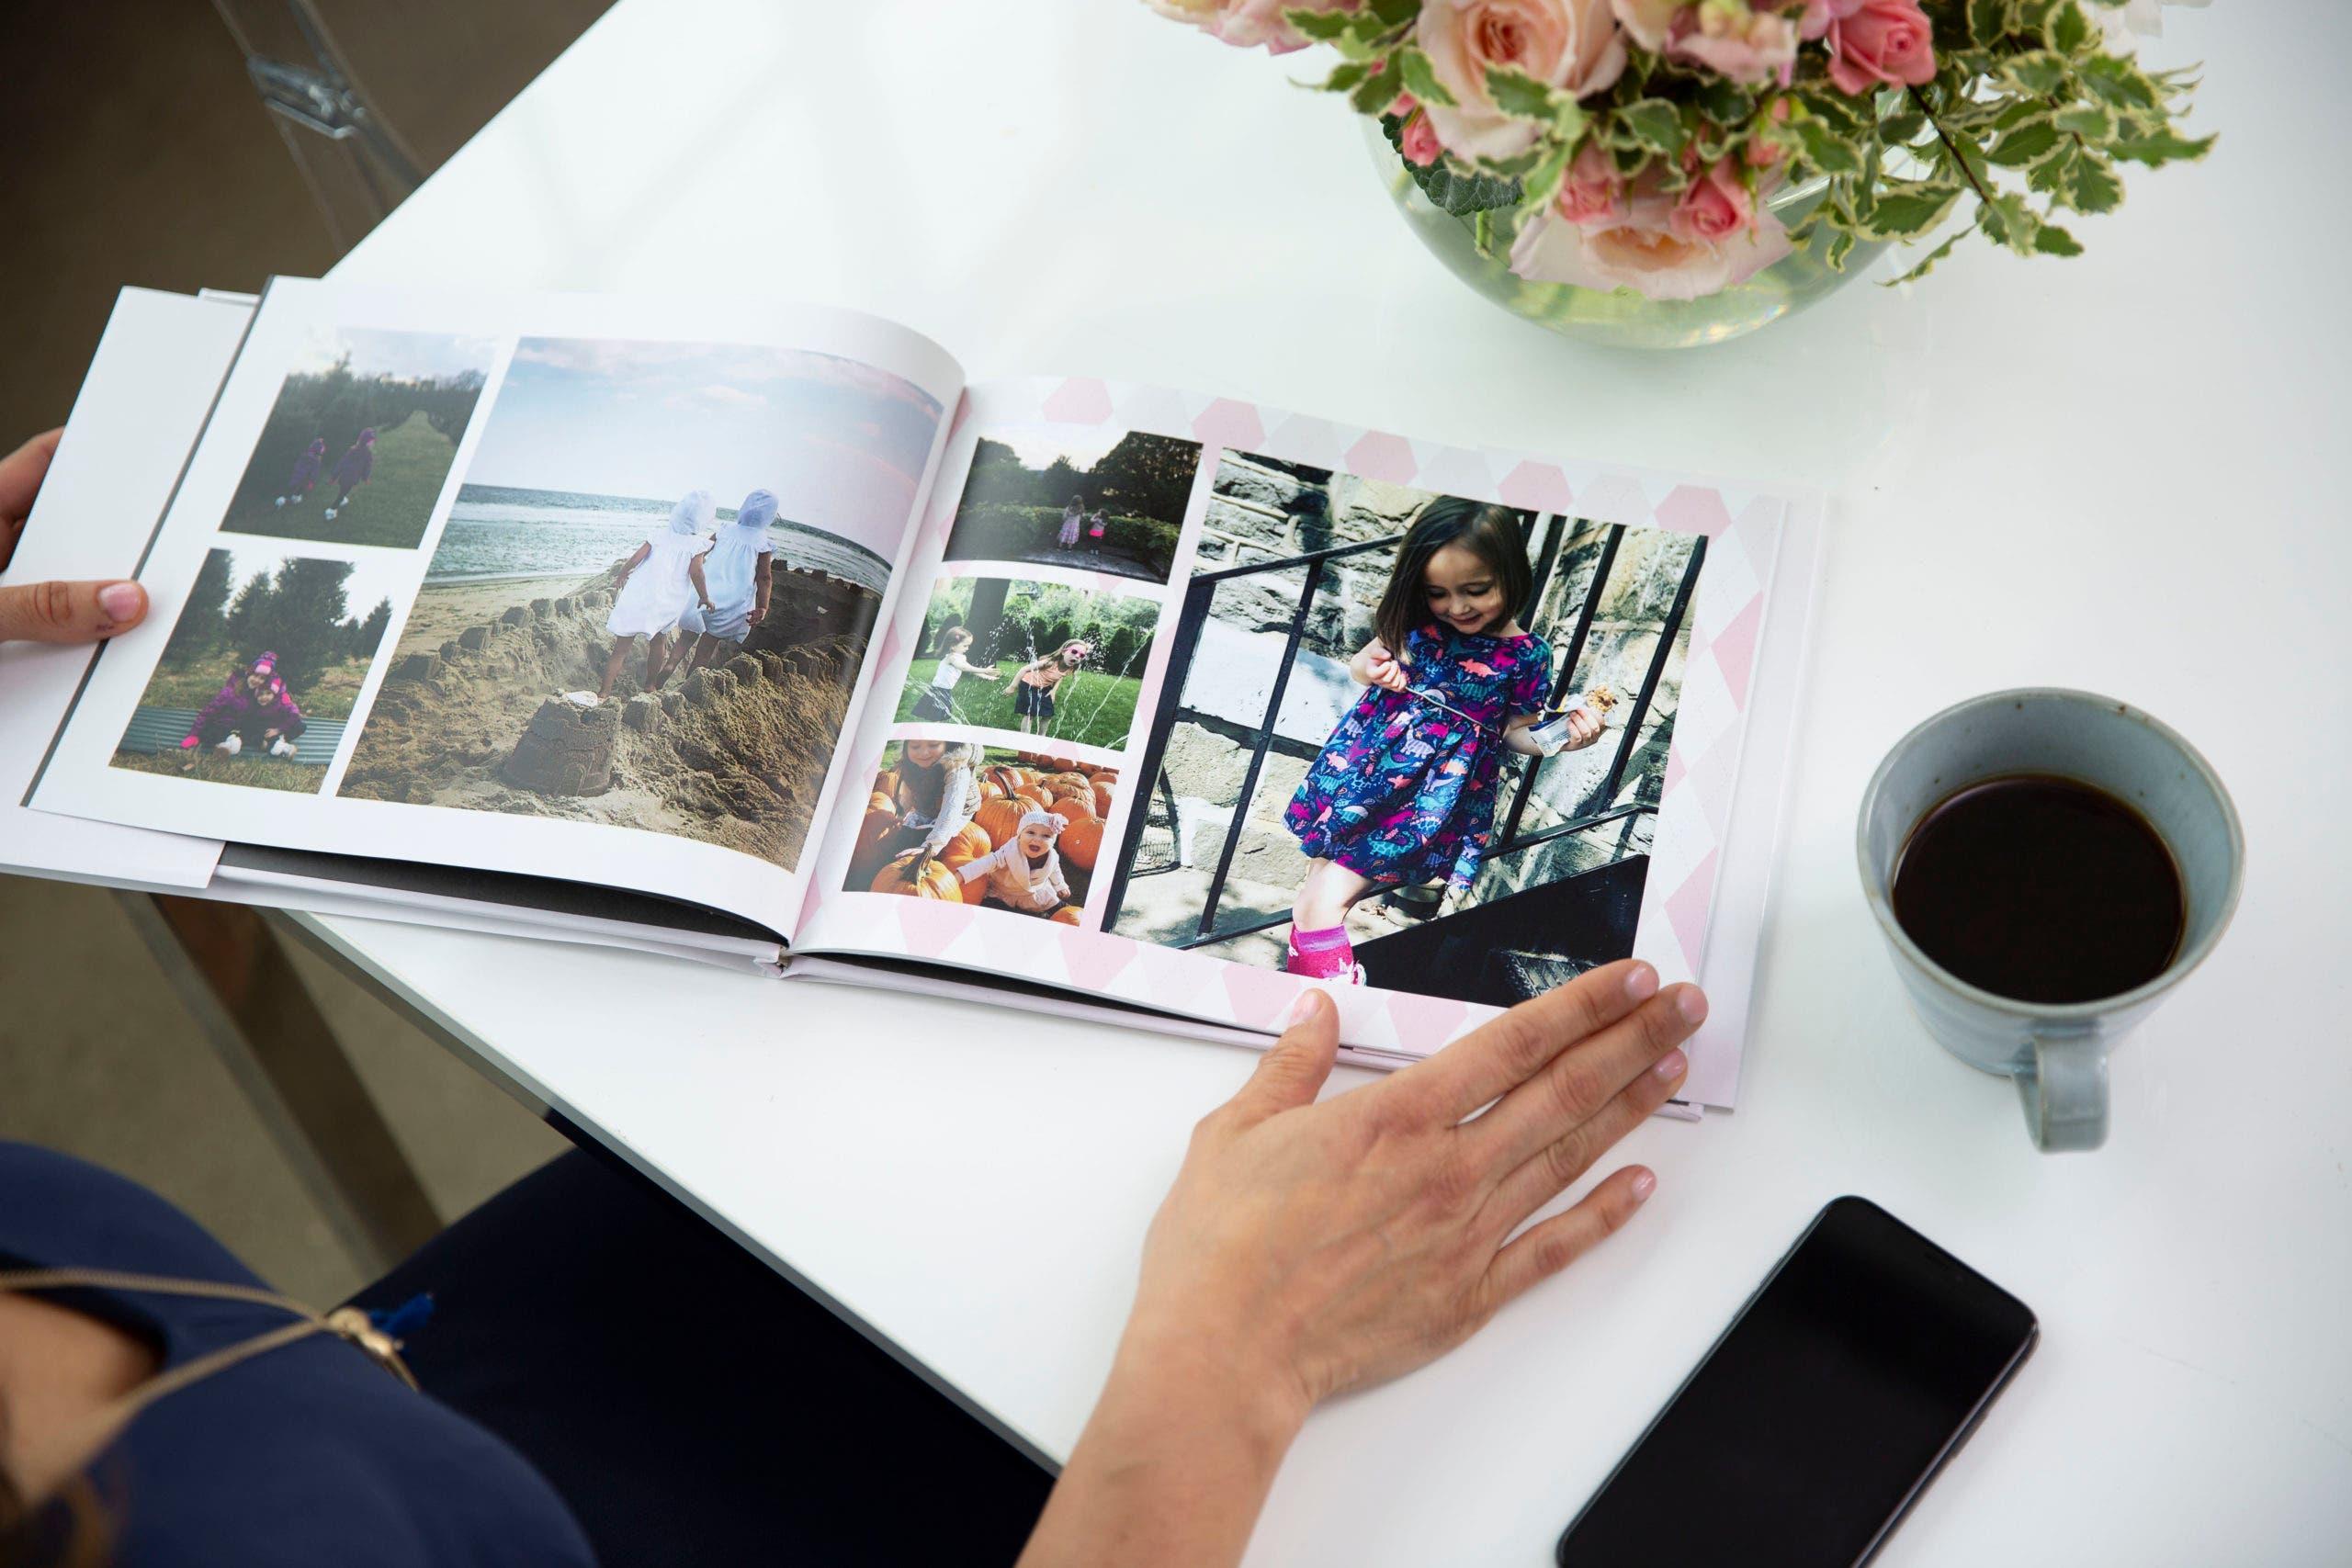 Motif Fotobuch